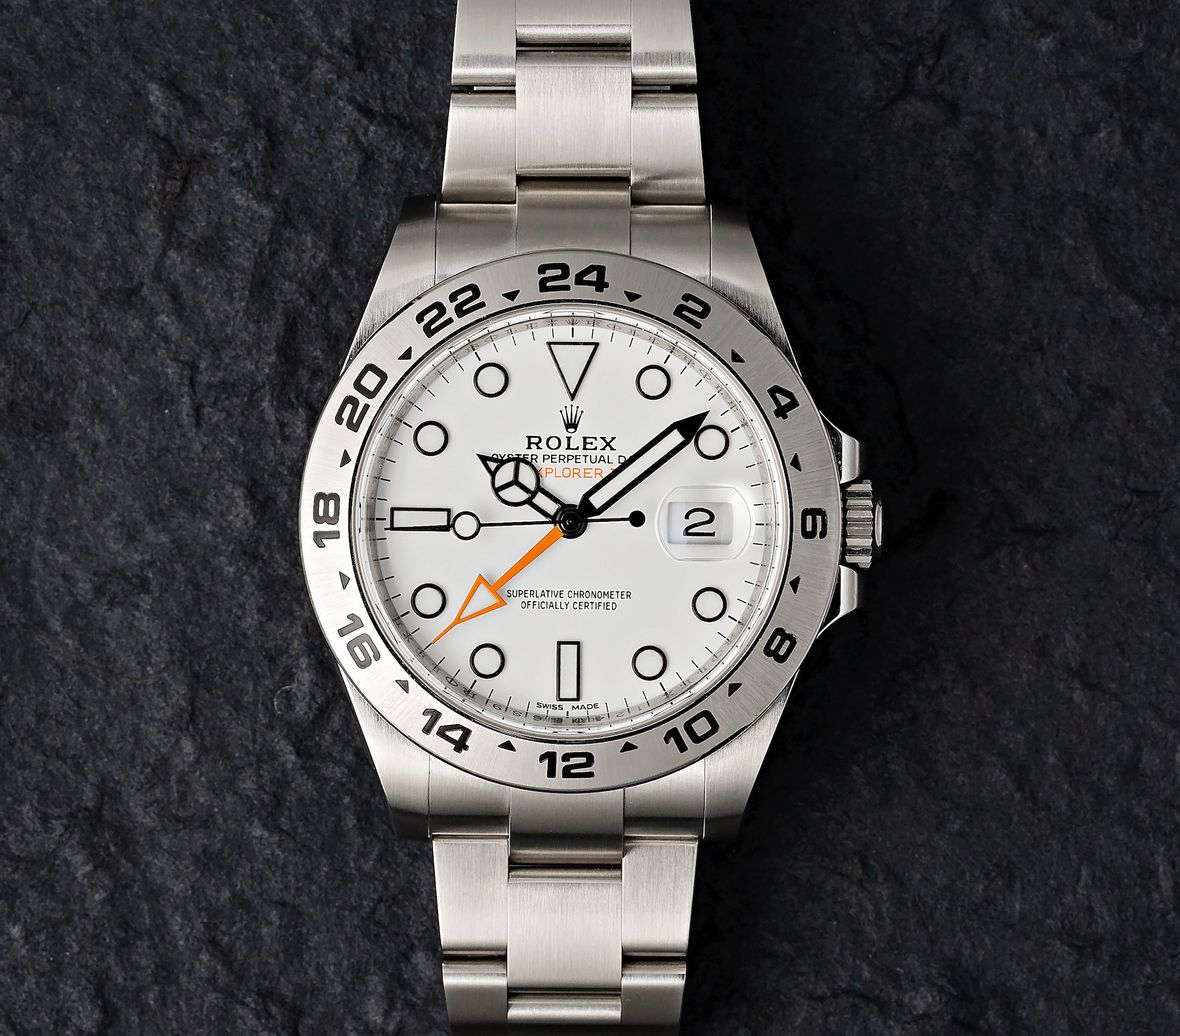 Rolex Explorer II 216570 Polar